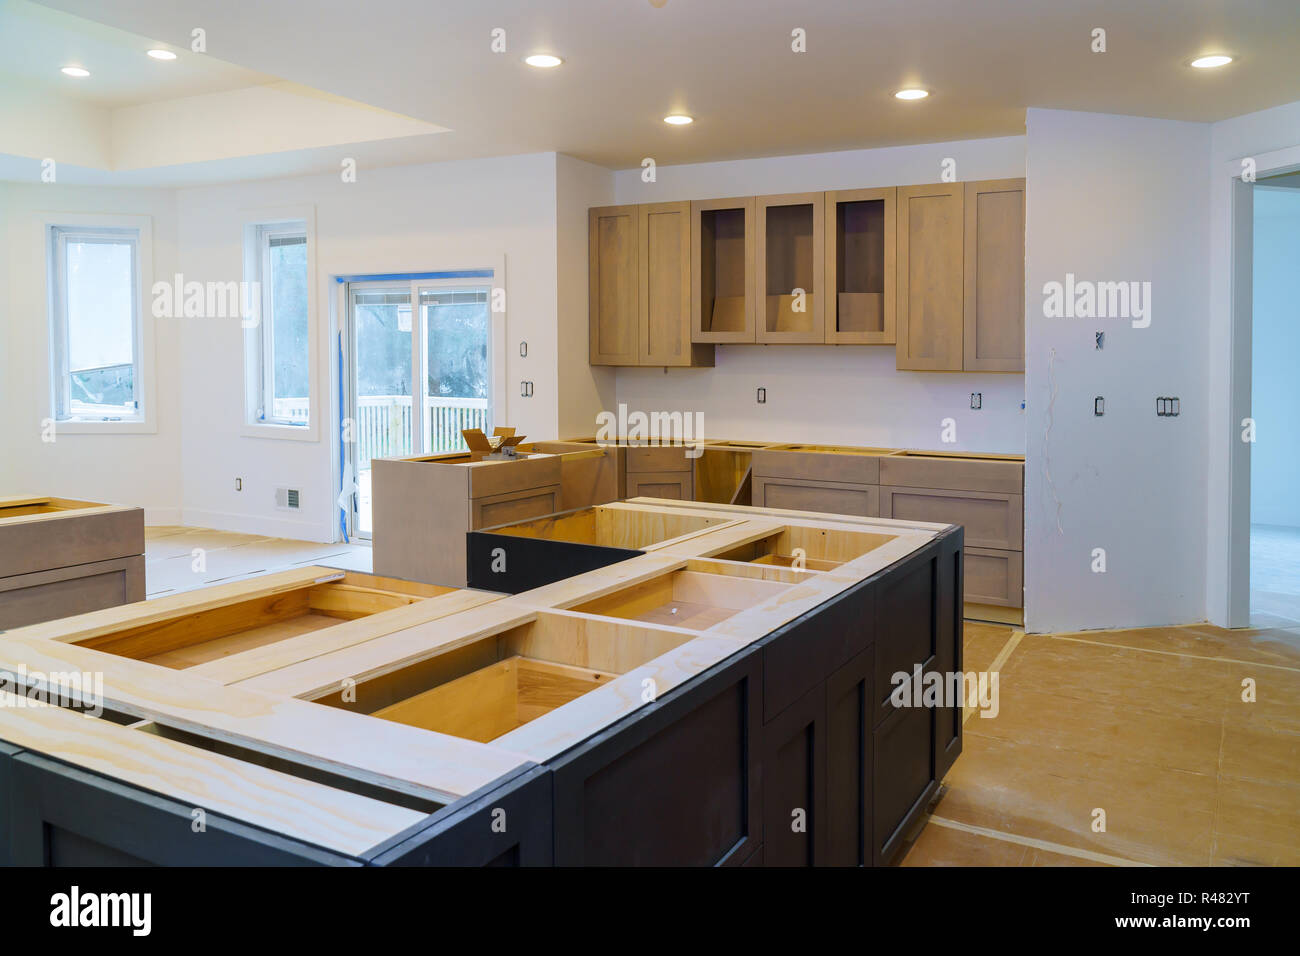 Installing New Induction Kitchen Kitchen Installation Of Kitchen Cabinet Stock Photo Alamy